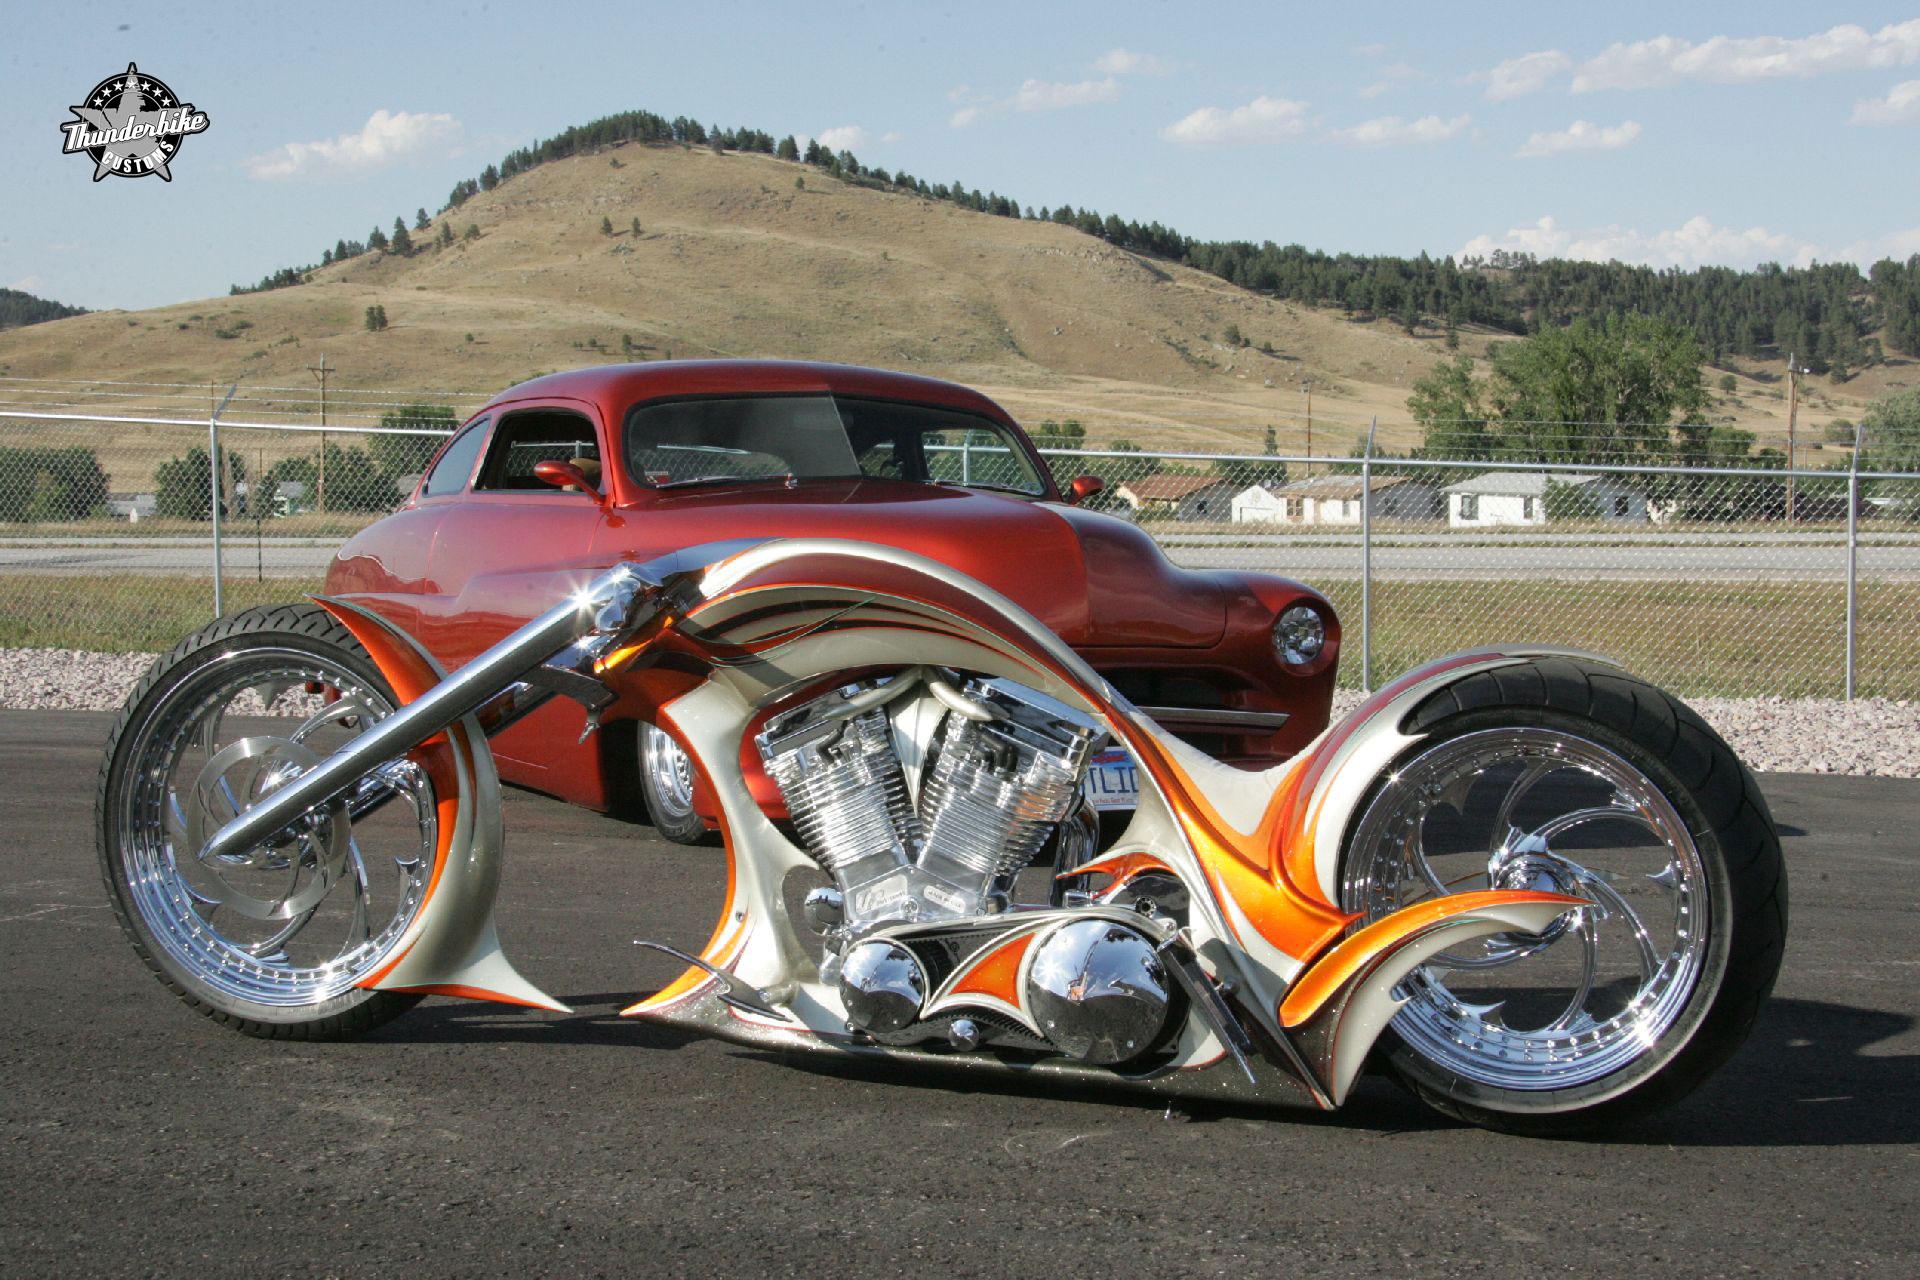 moto tuning peinture